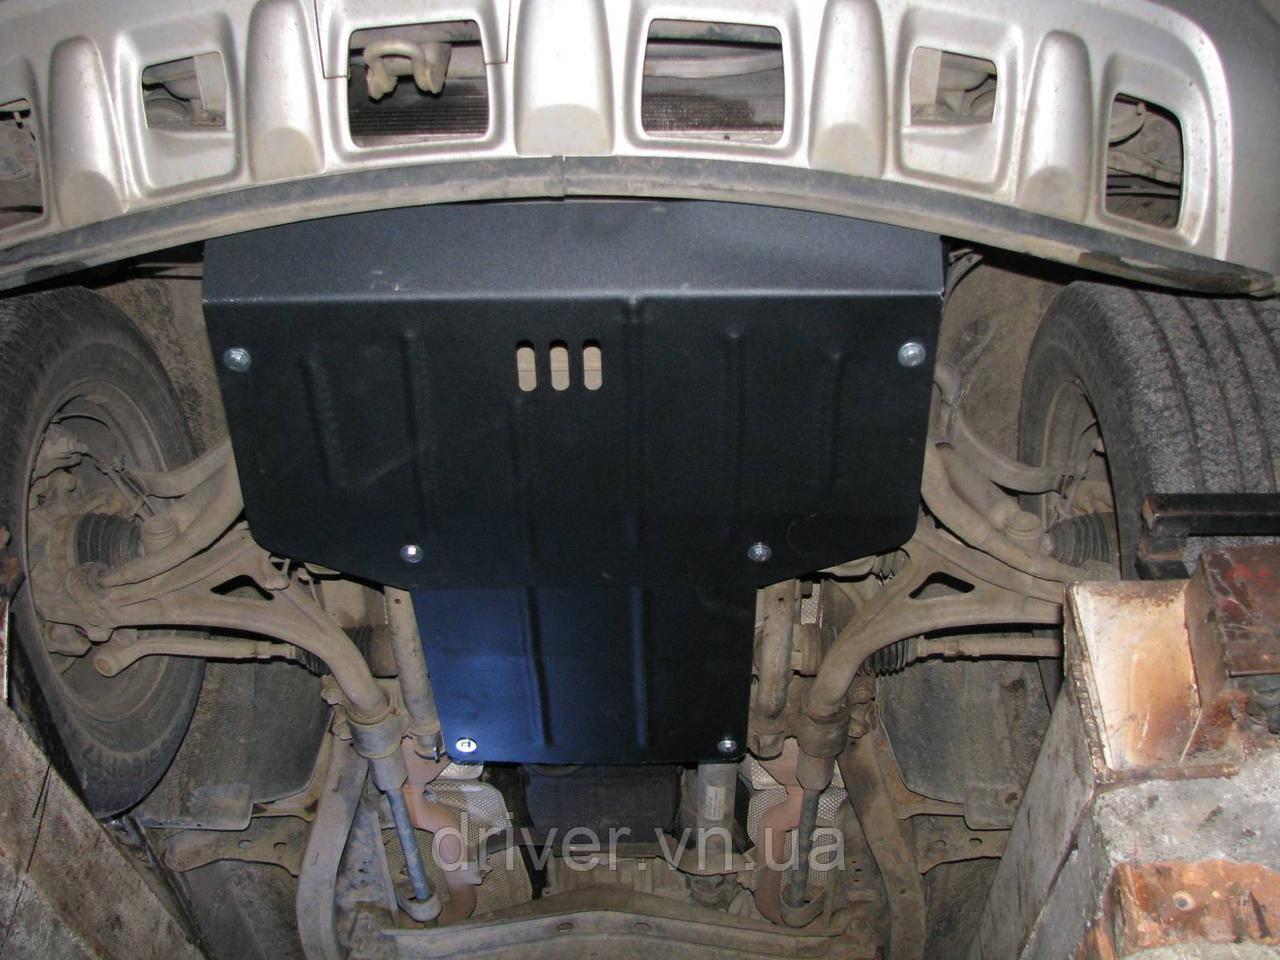 Захист двигуна MERCEDES-BENZ M-CLASS W163 1997-2005 (двигун+КПП+радіатор)